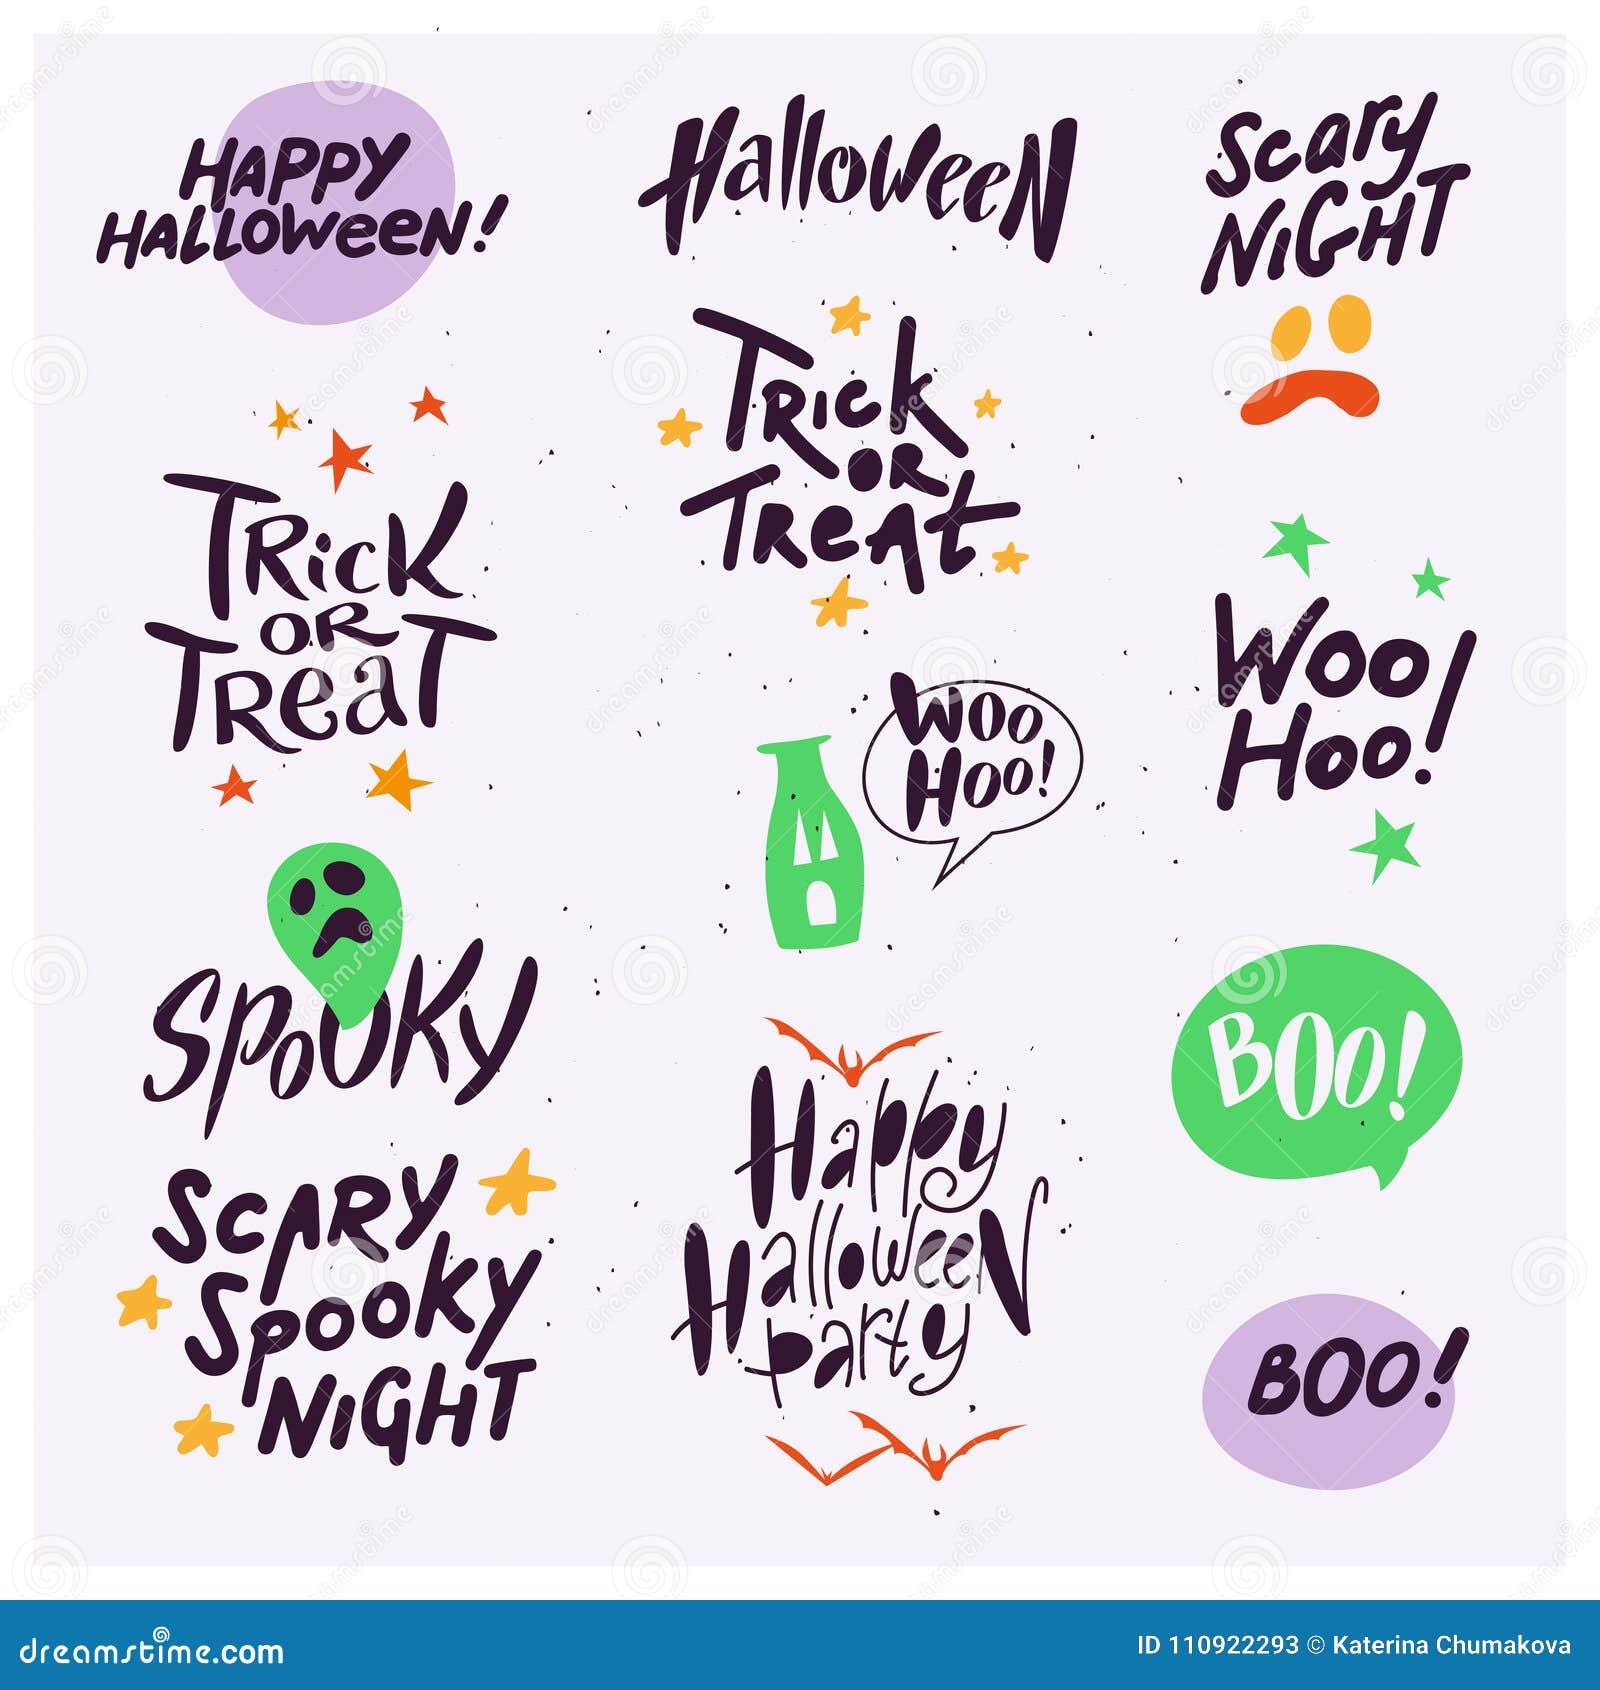 Halloween Phrases.Halloween Phrases Stock Illustrations 211 Halloween Phrases Stock Illustrations Vectors Clipart Dreamstime